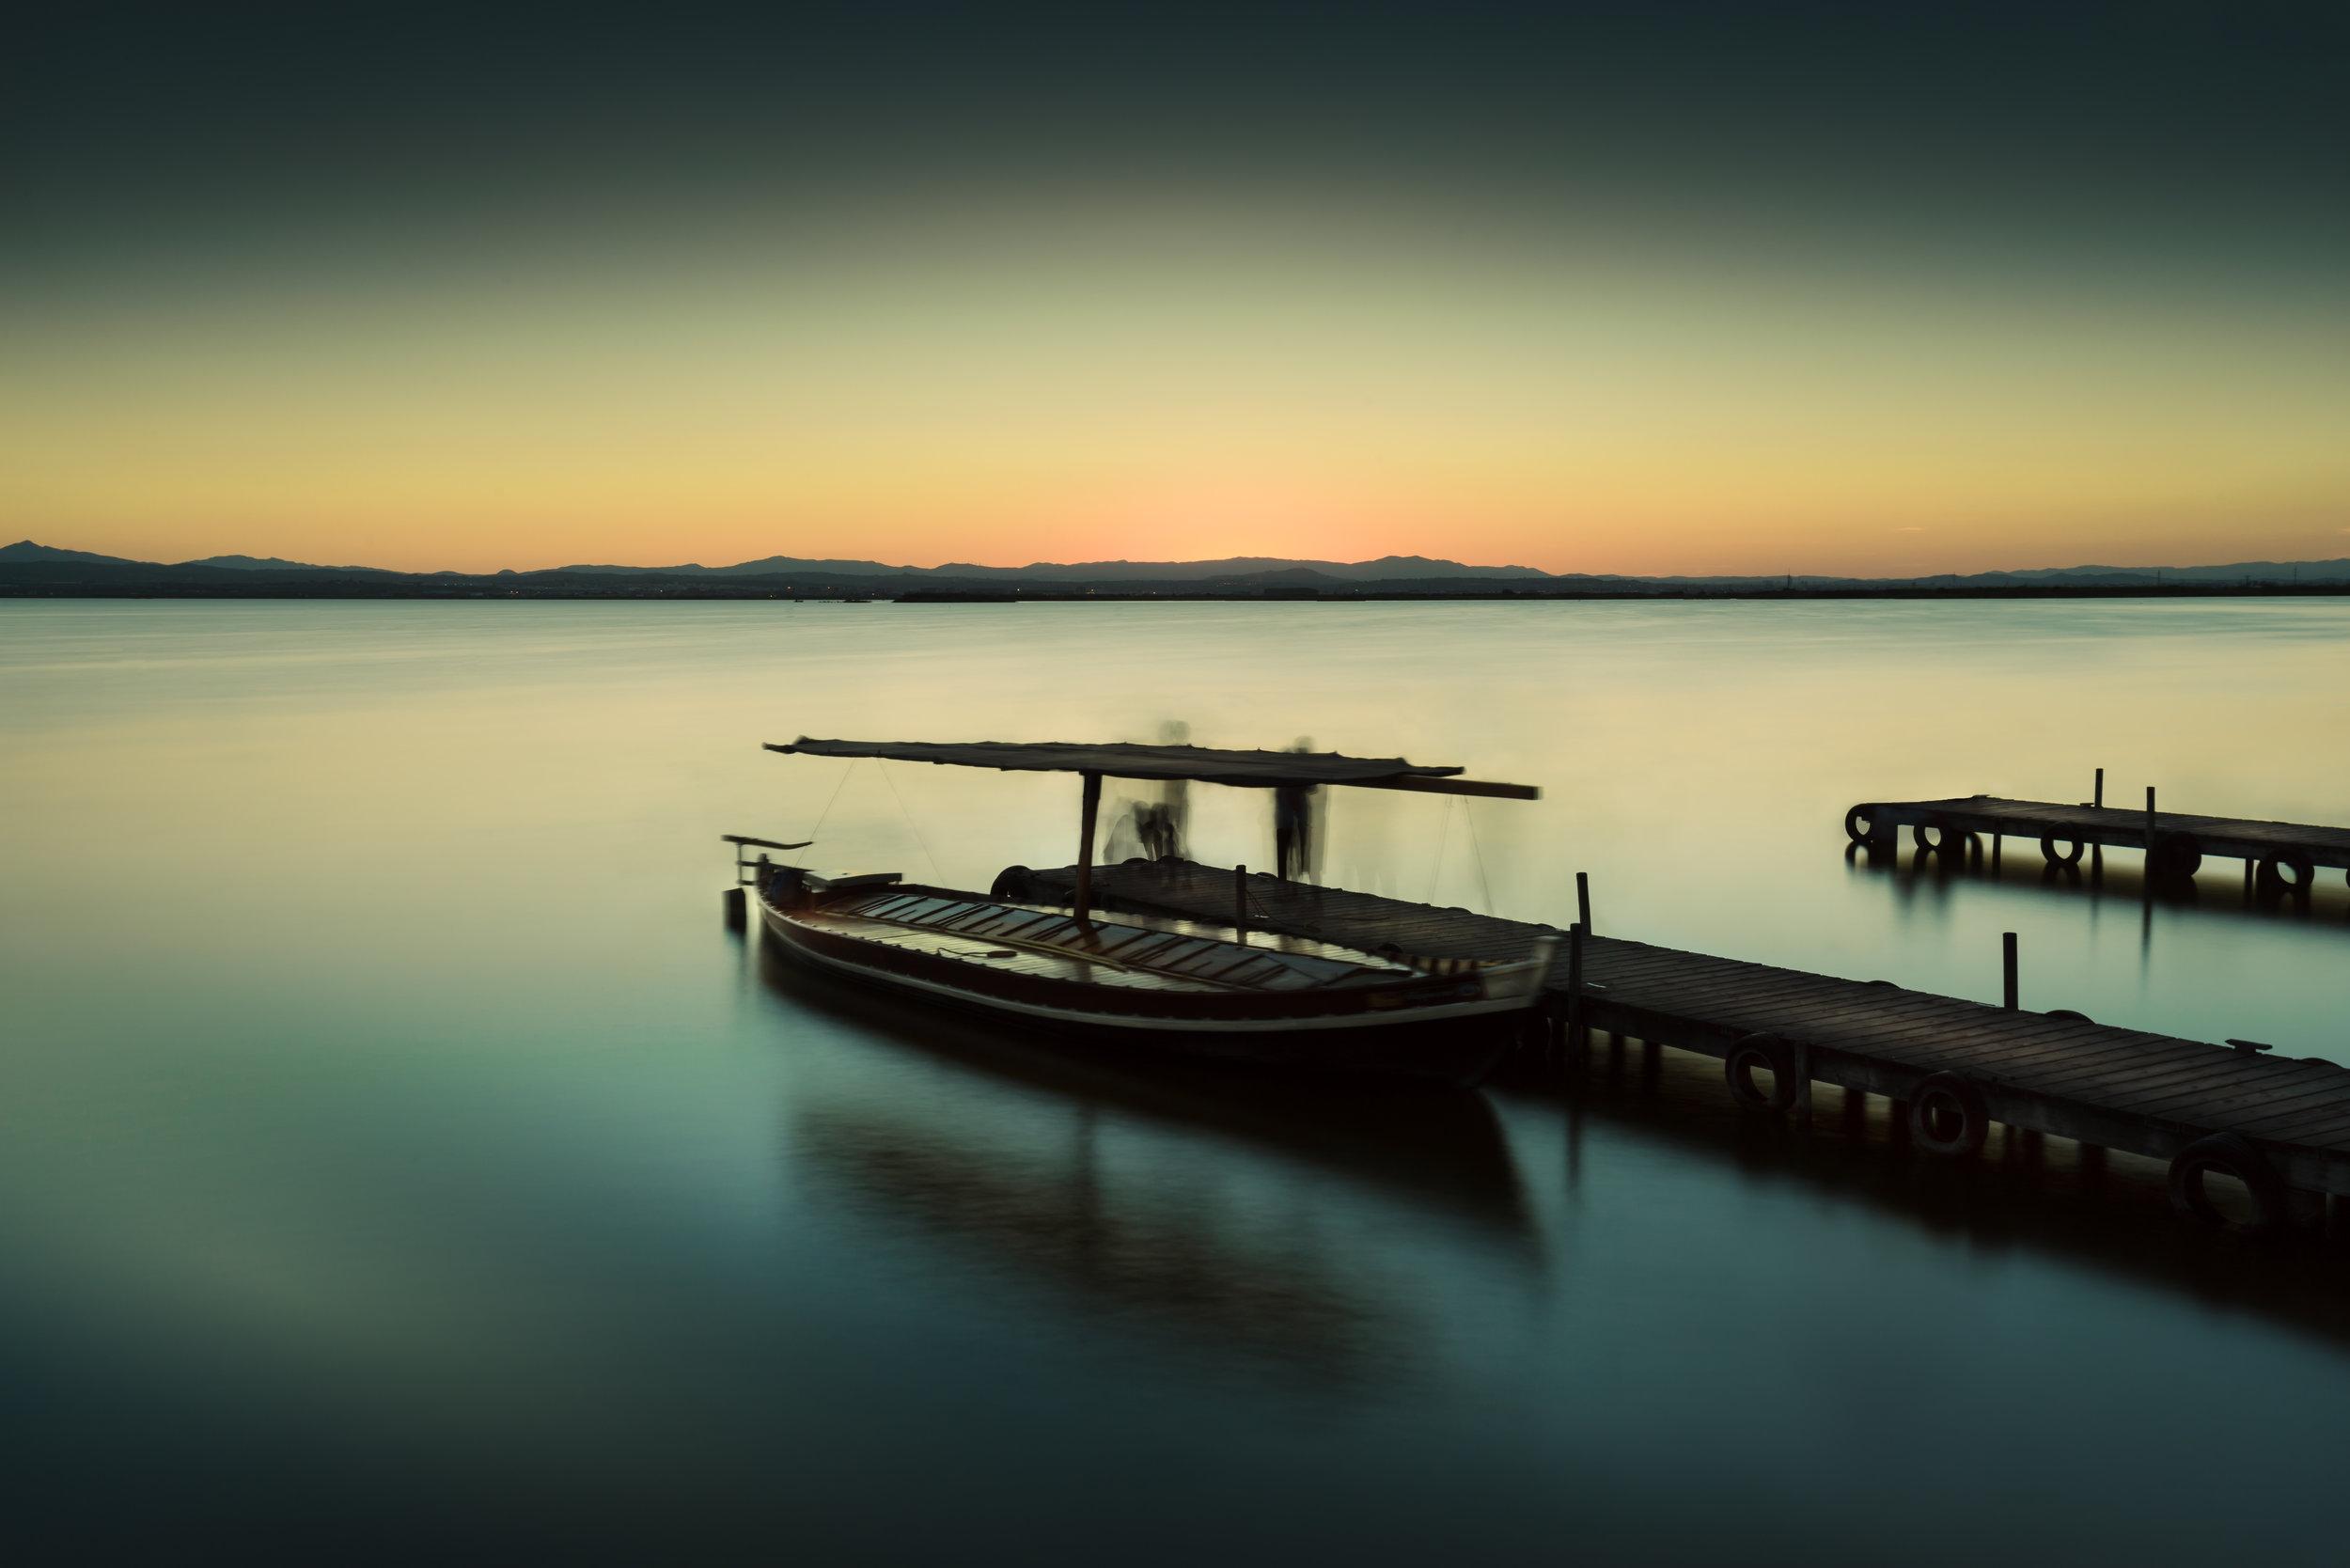 dusk over the secret sea